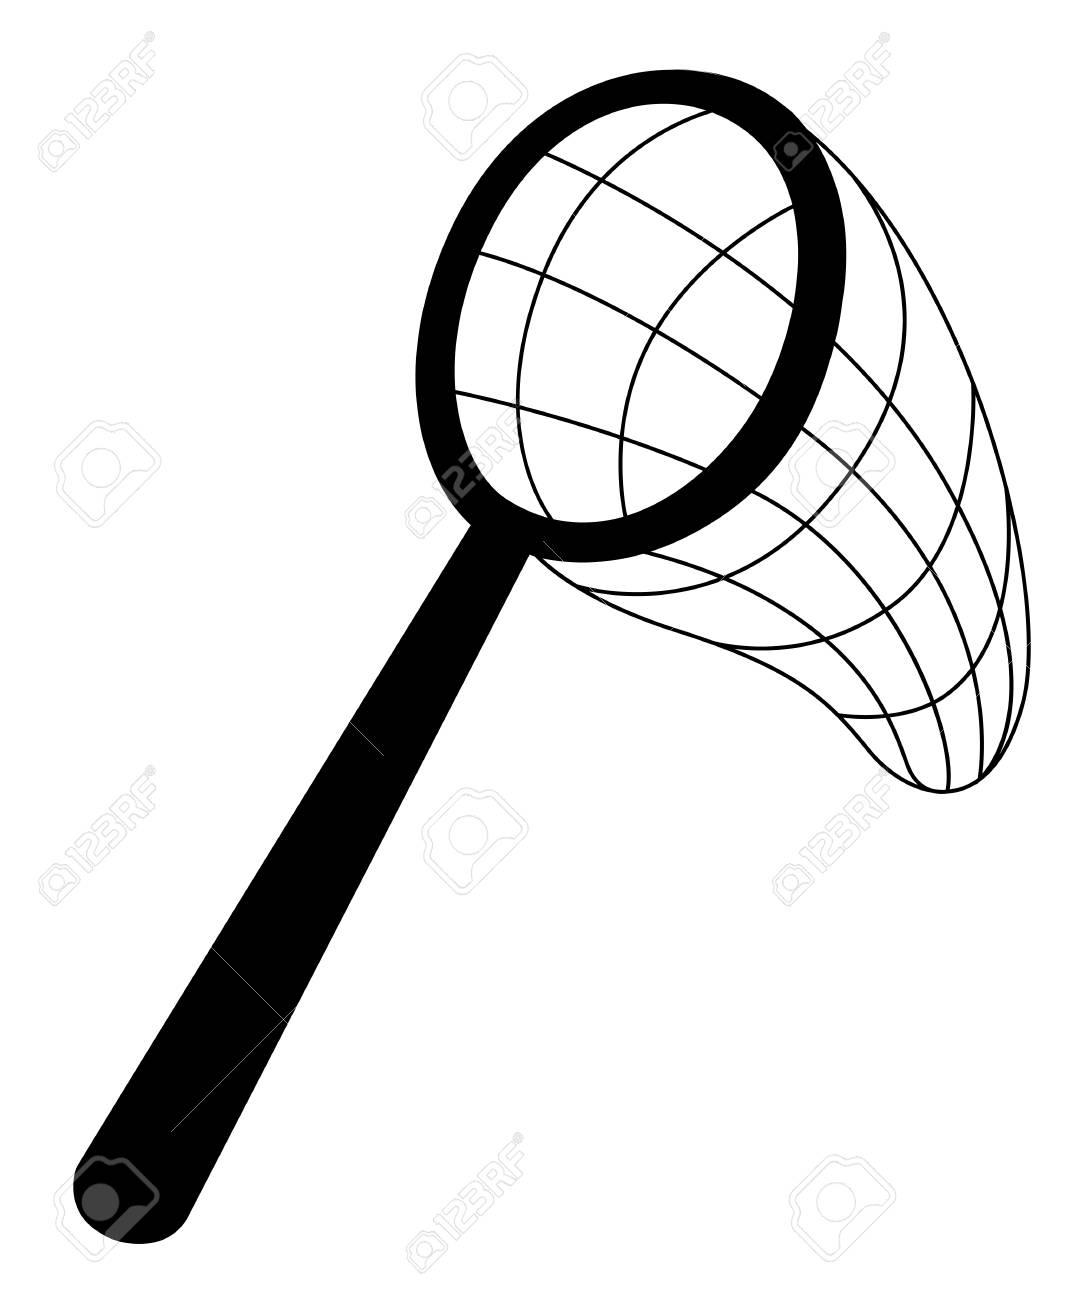 Black silhouette. Butterfly net. Classic net design, wooden handle.